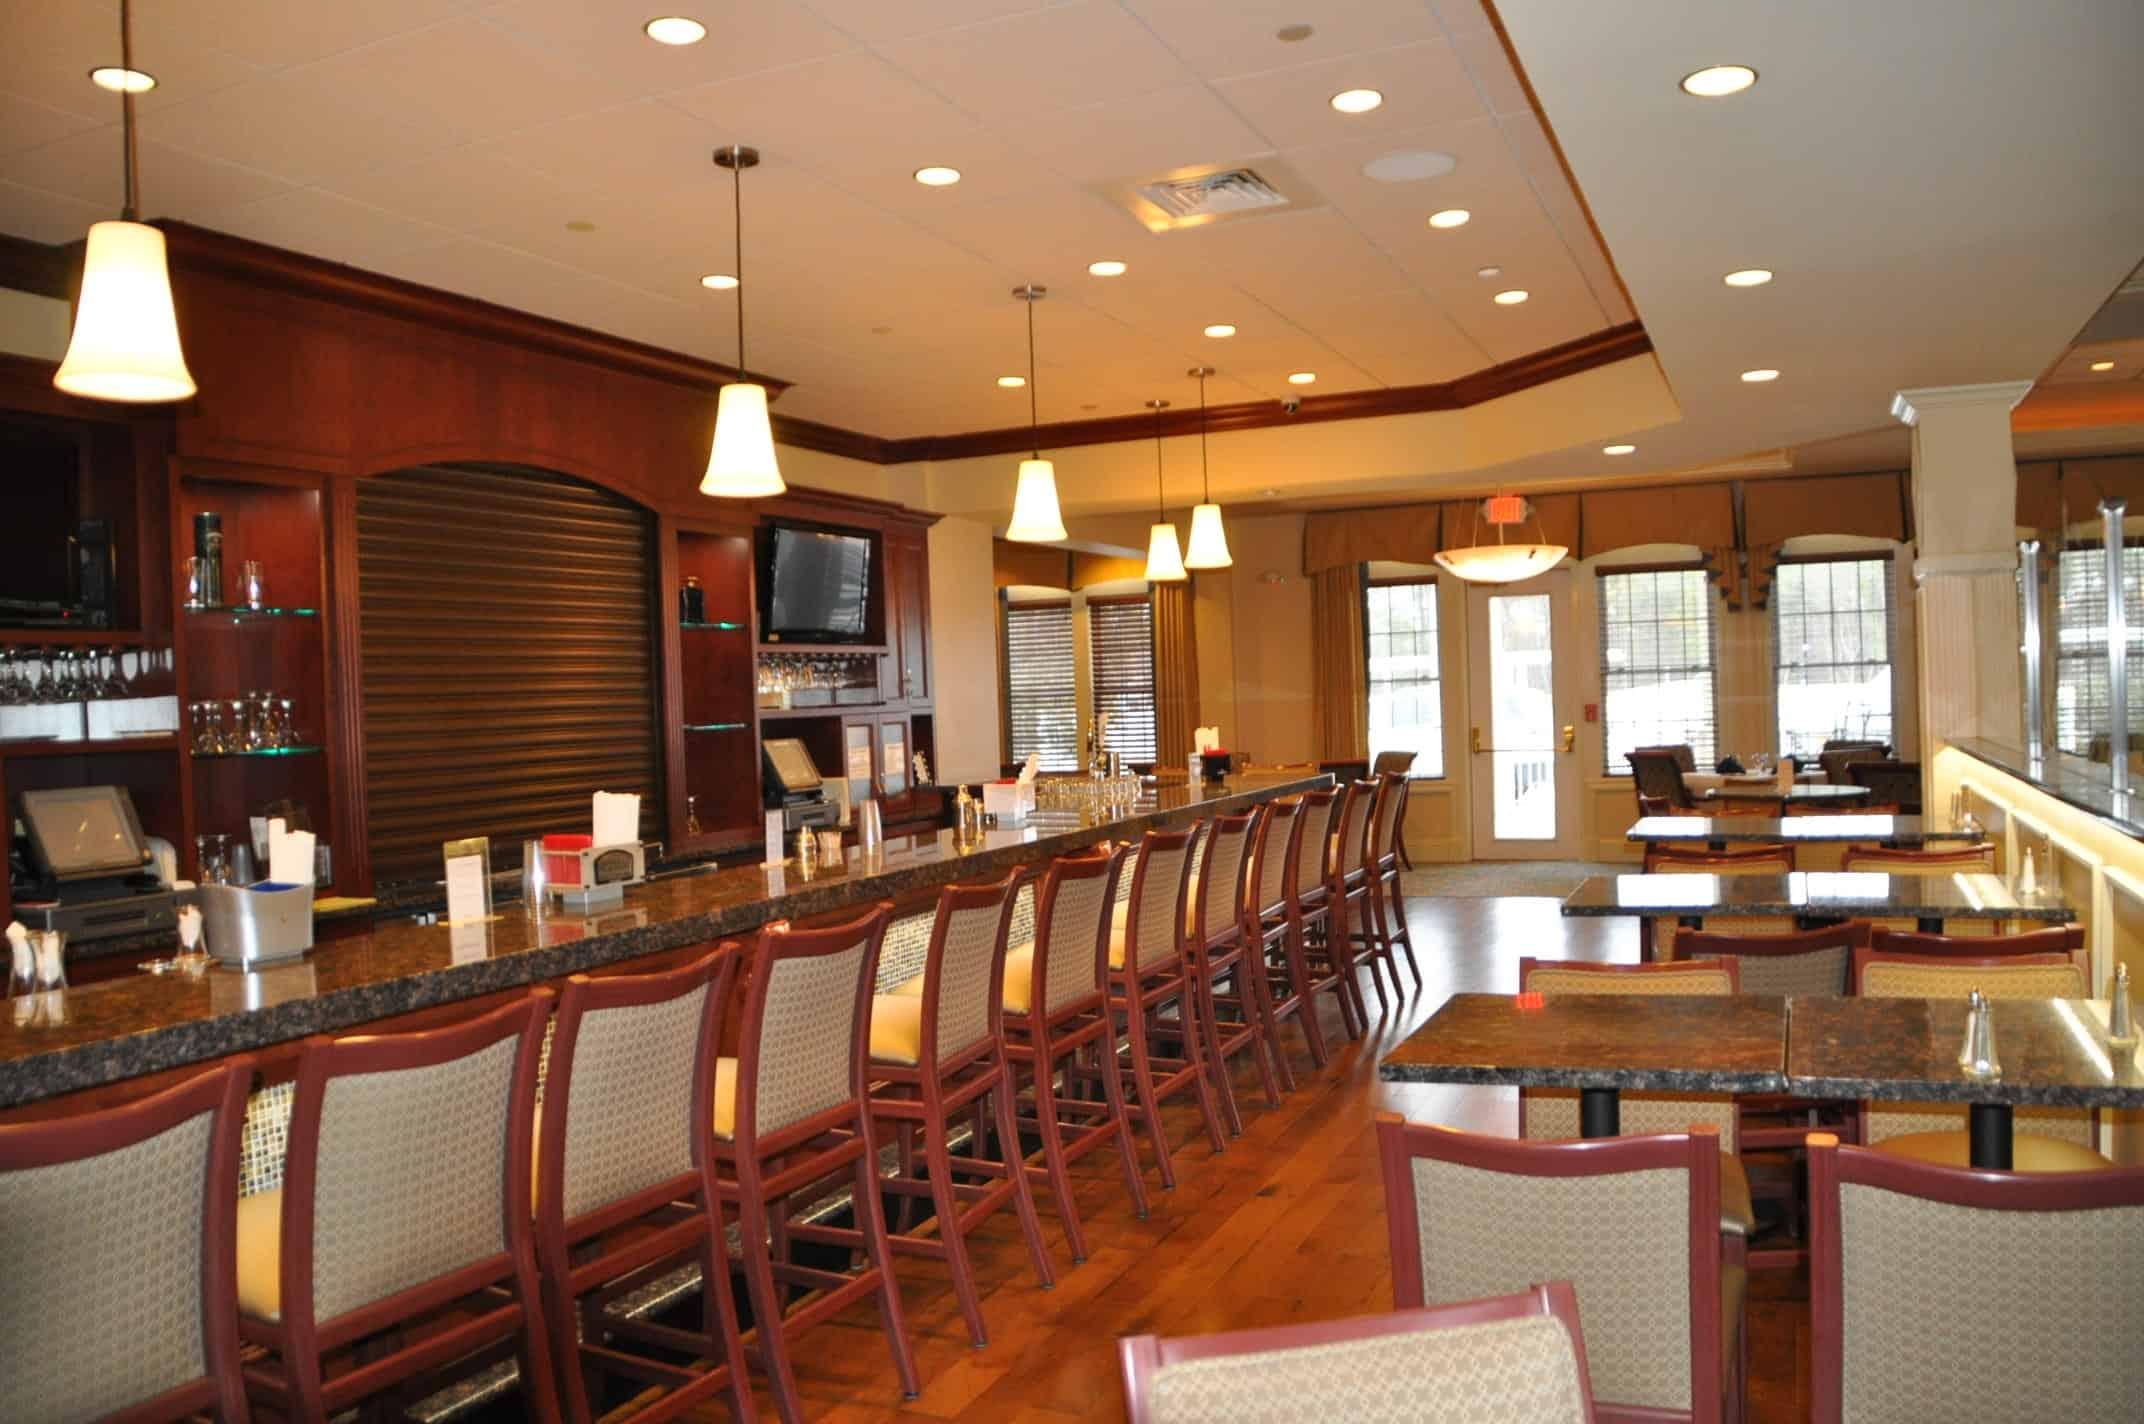 Commercial Interior Design, New Construction, Renovation